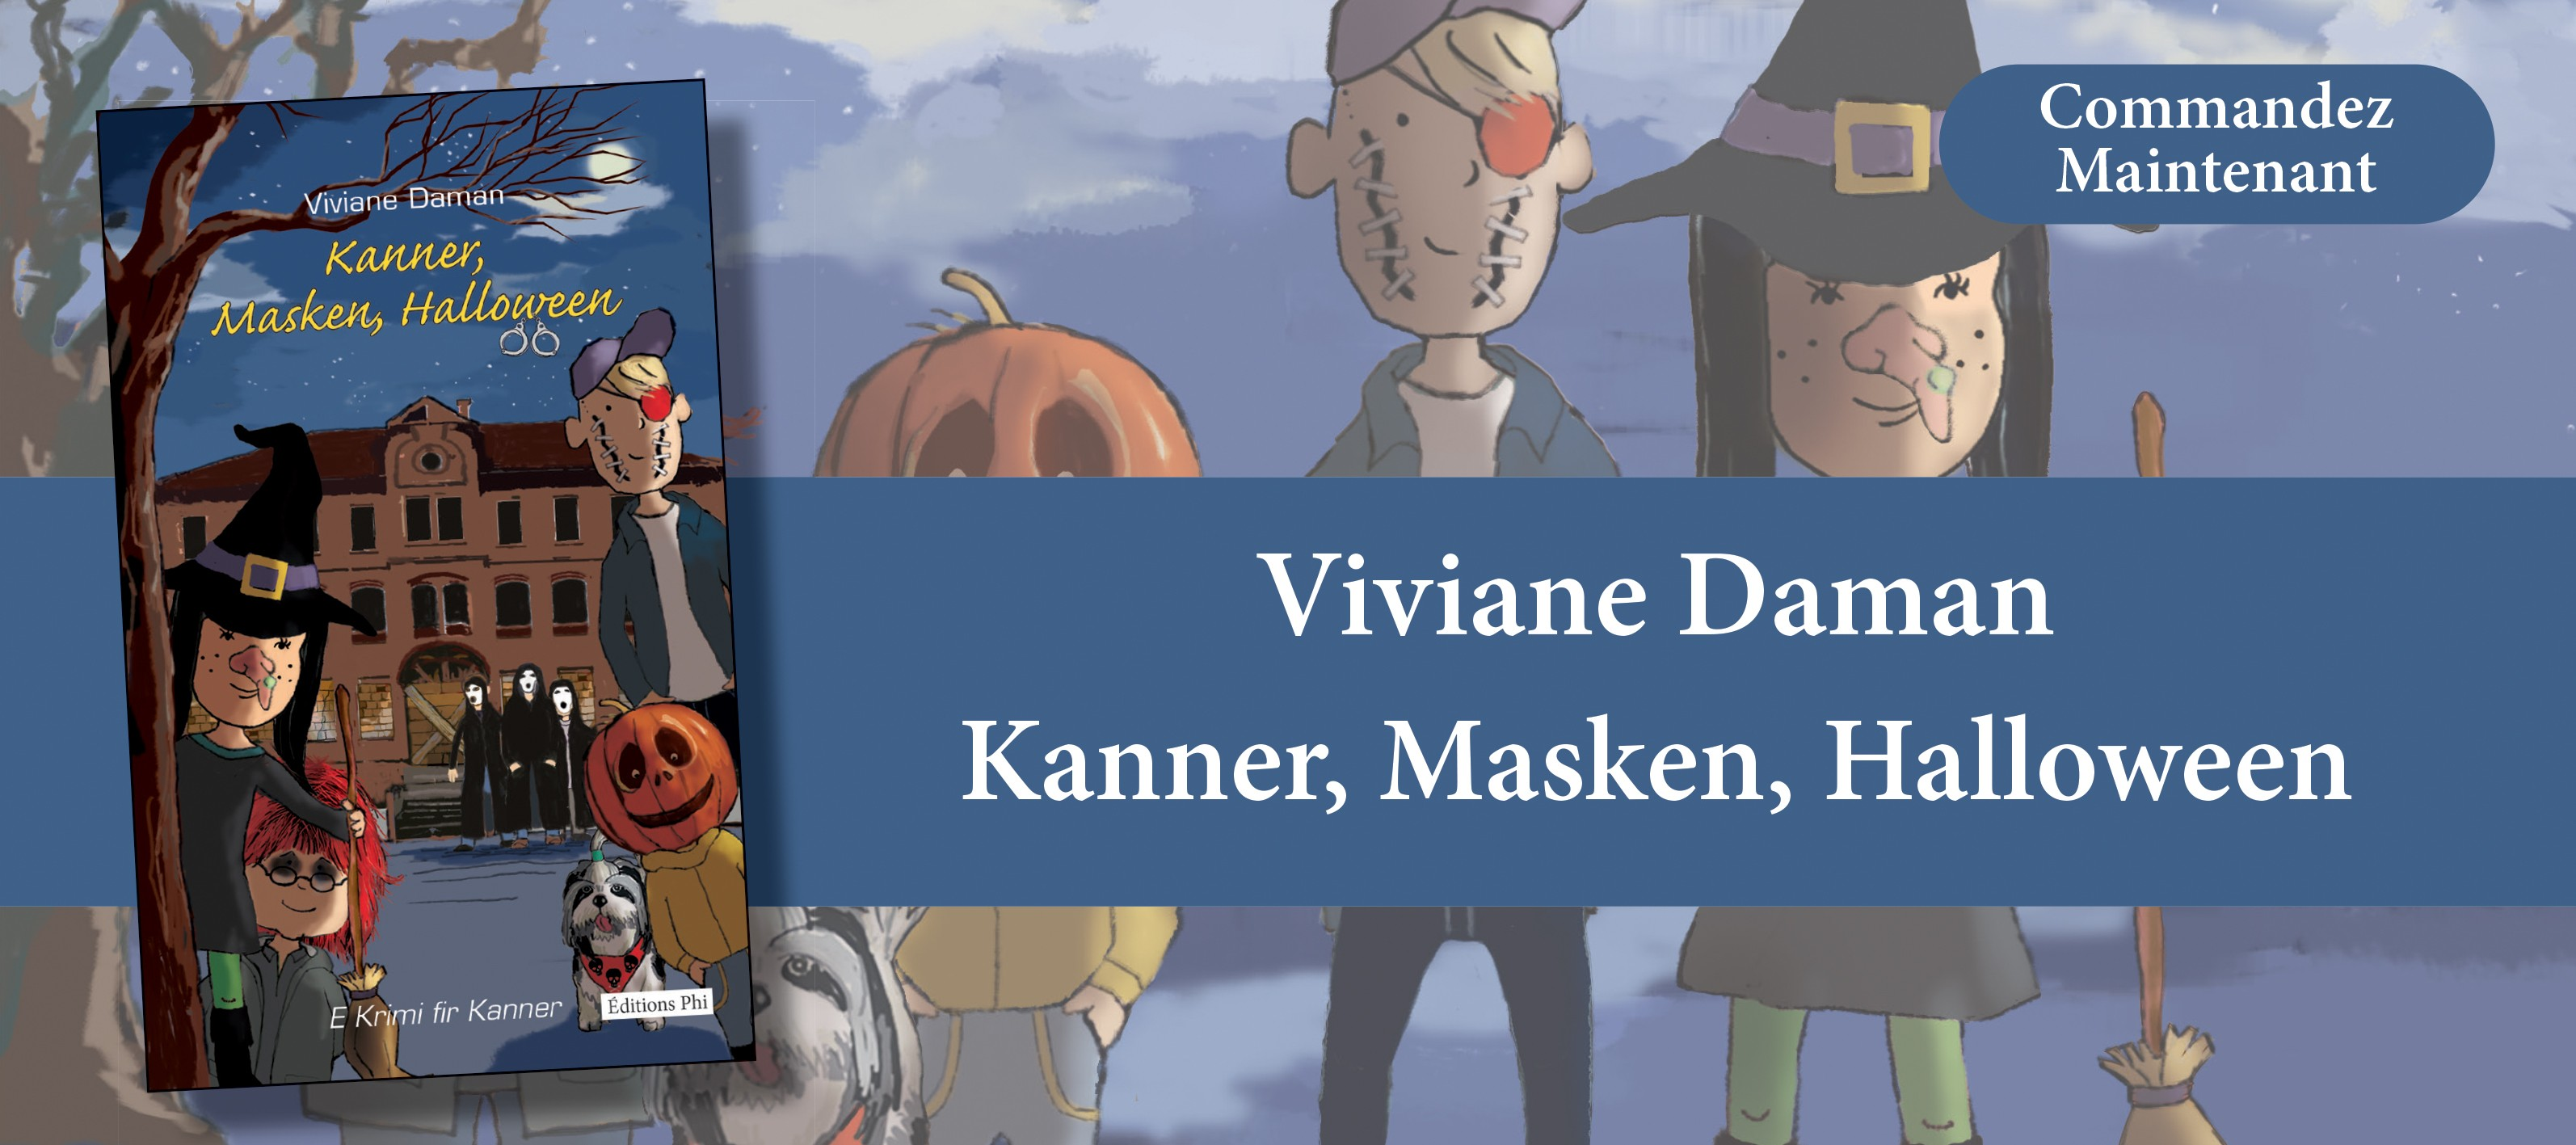 http://www.editionsphi.lu/fr/jeunesse/478-viviane-daman-kanner-masken-halloween.html